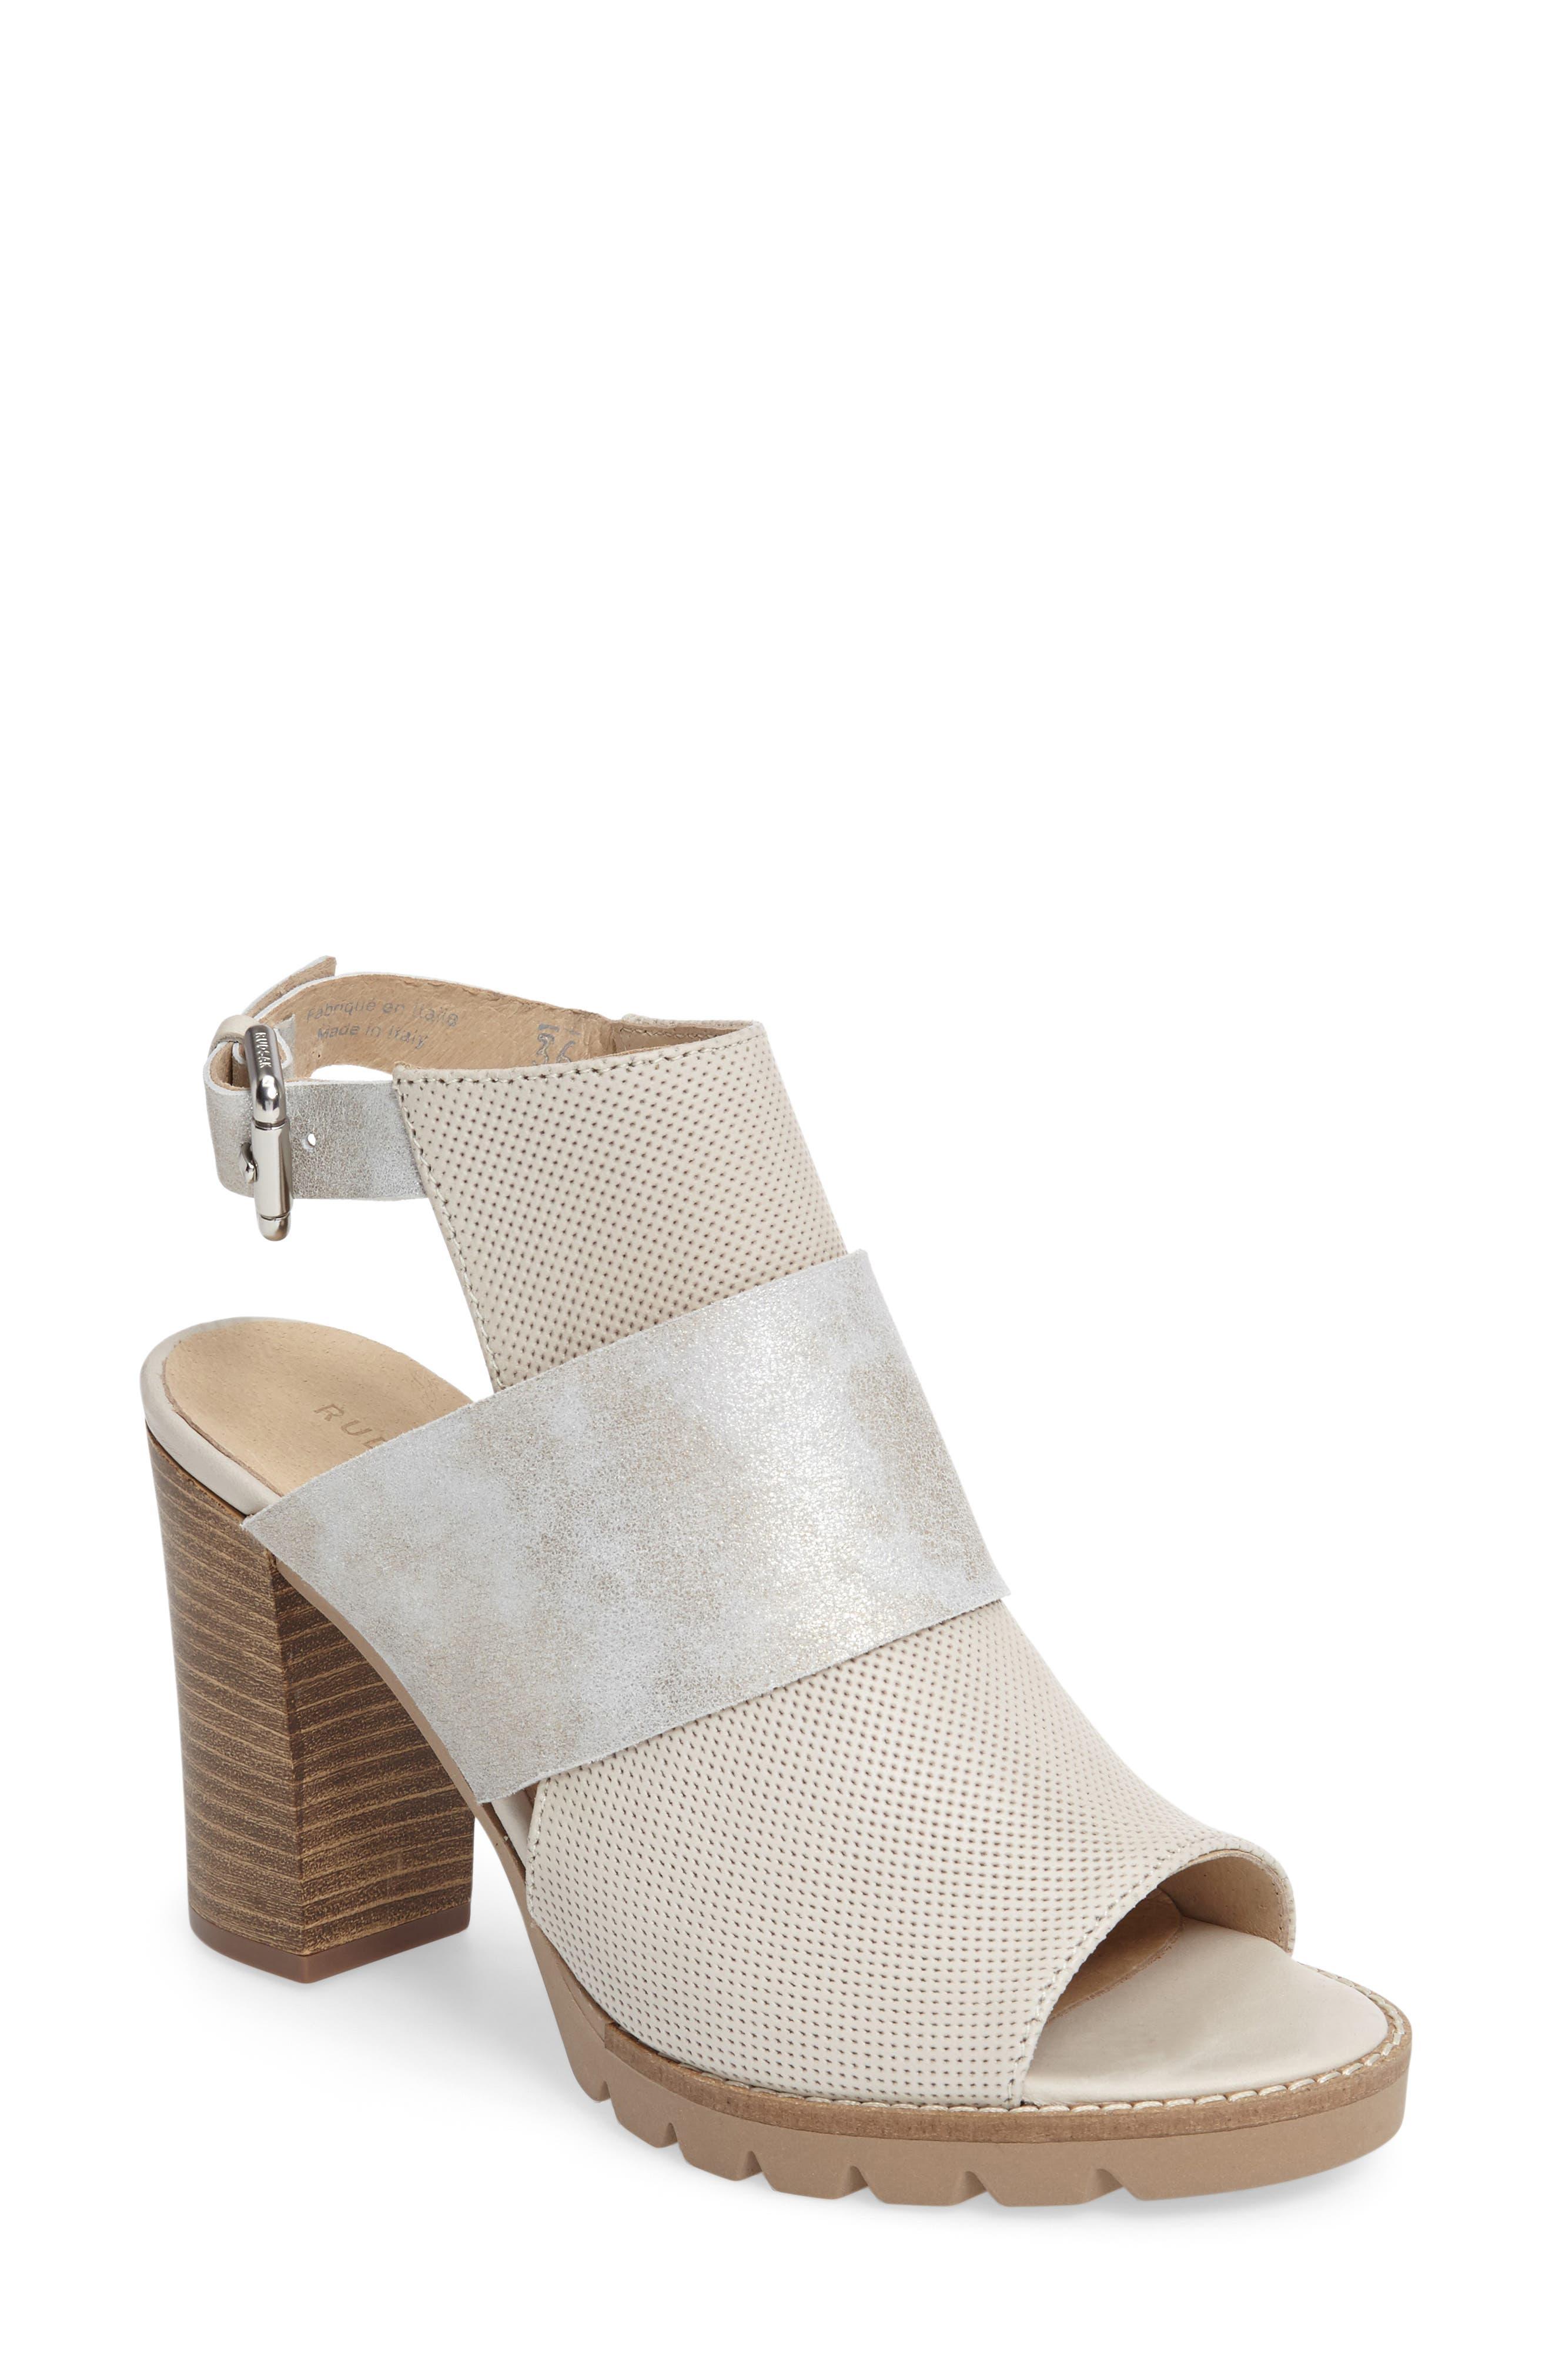 Alternate Image 1 Selected - Rudsak Brittni Block Heel Sandal (Women)